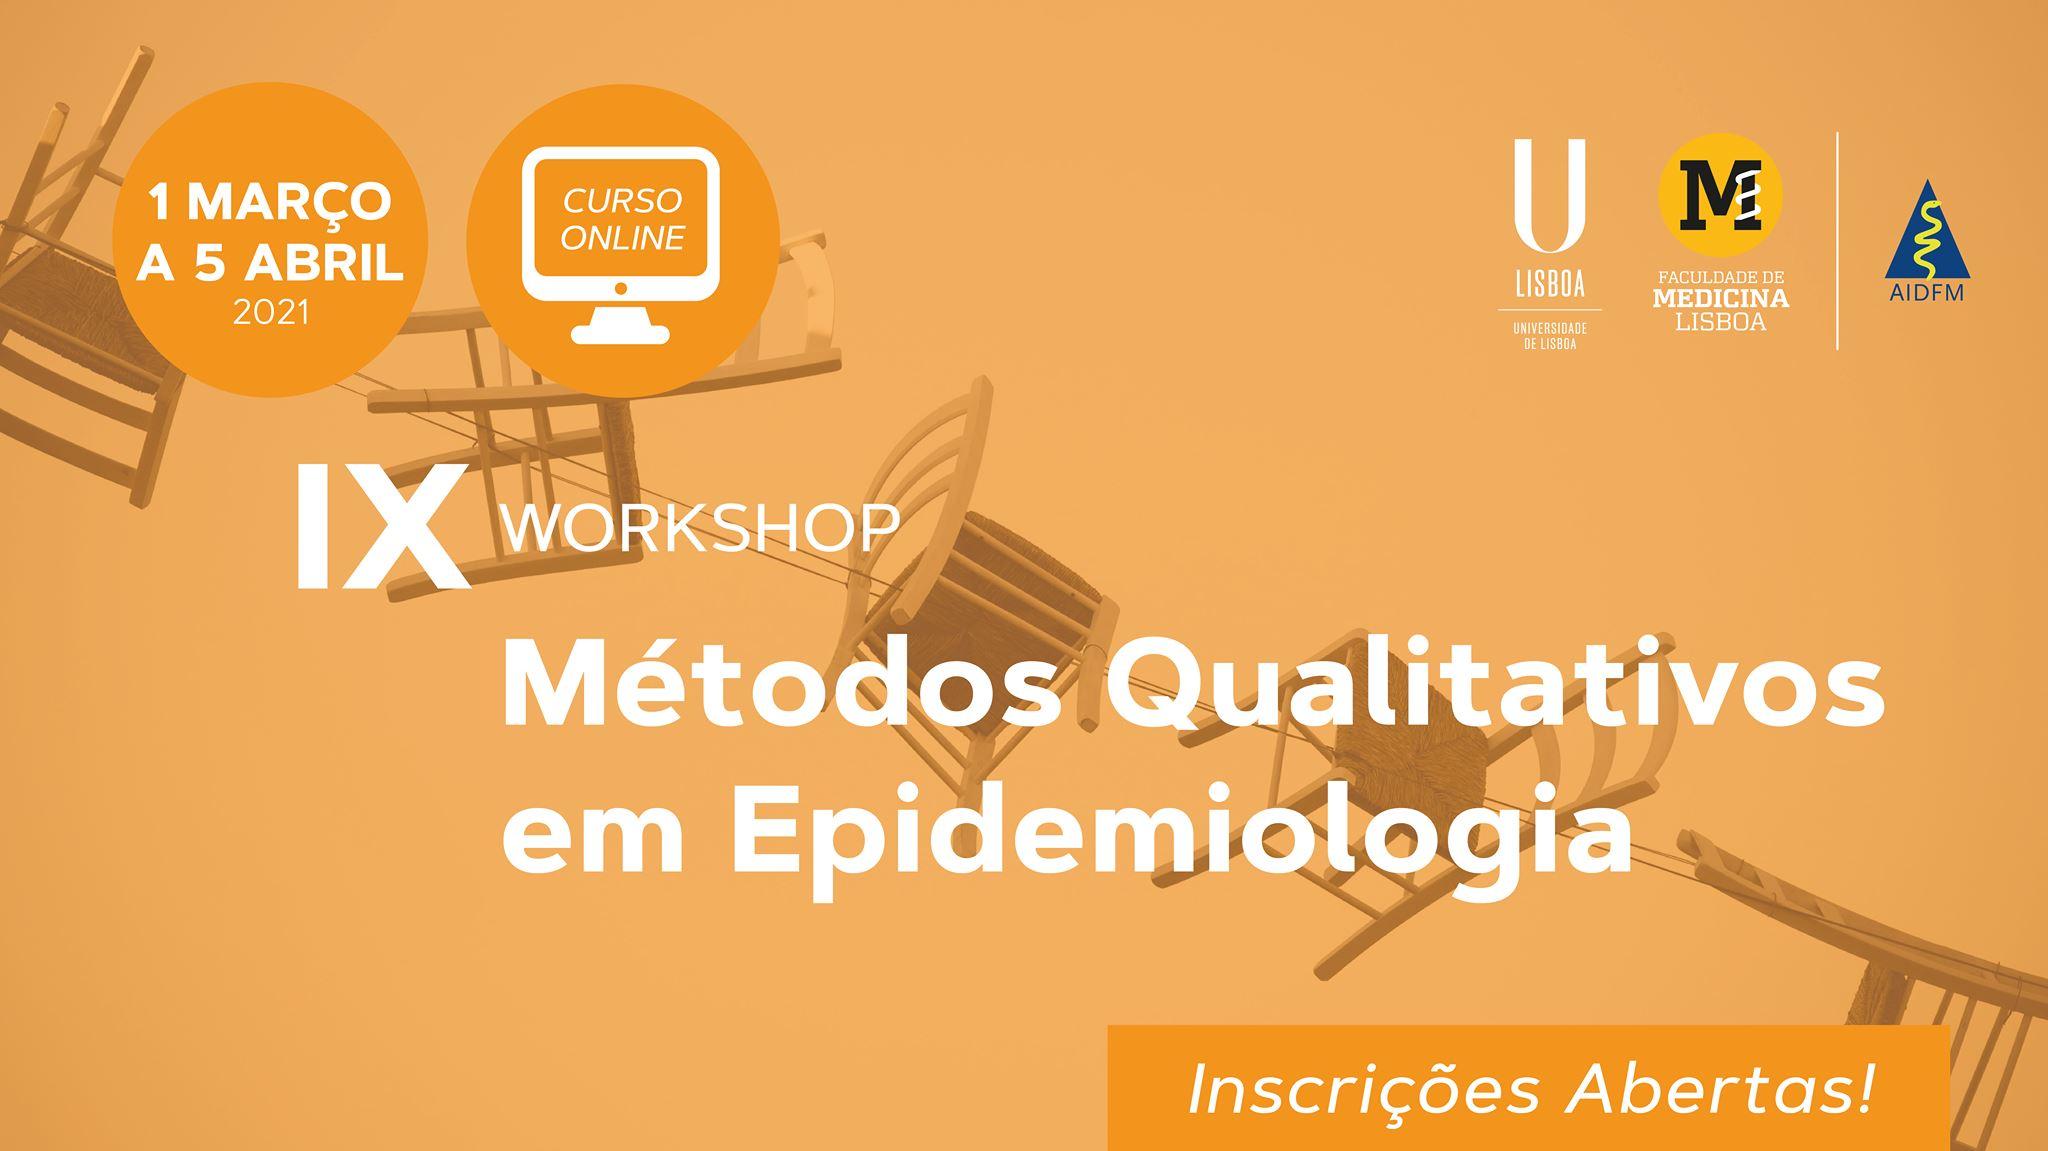 IX Workshop Métodos Qualitativos em Epidemiologia